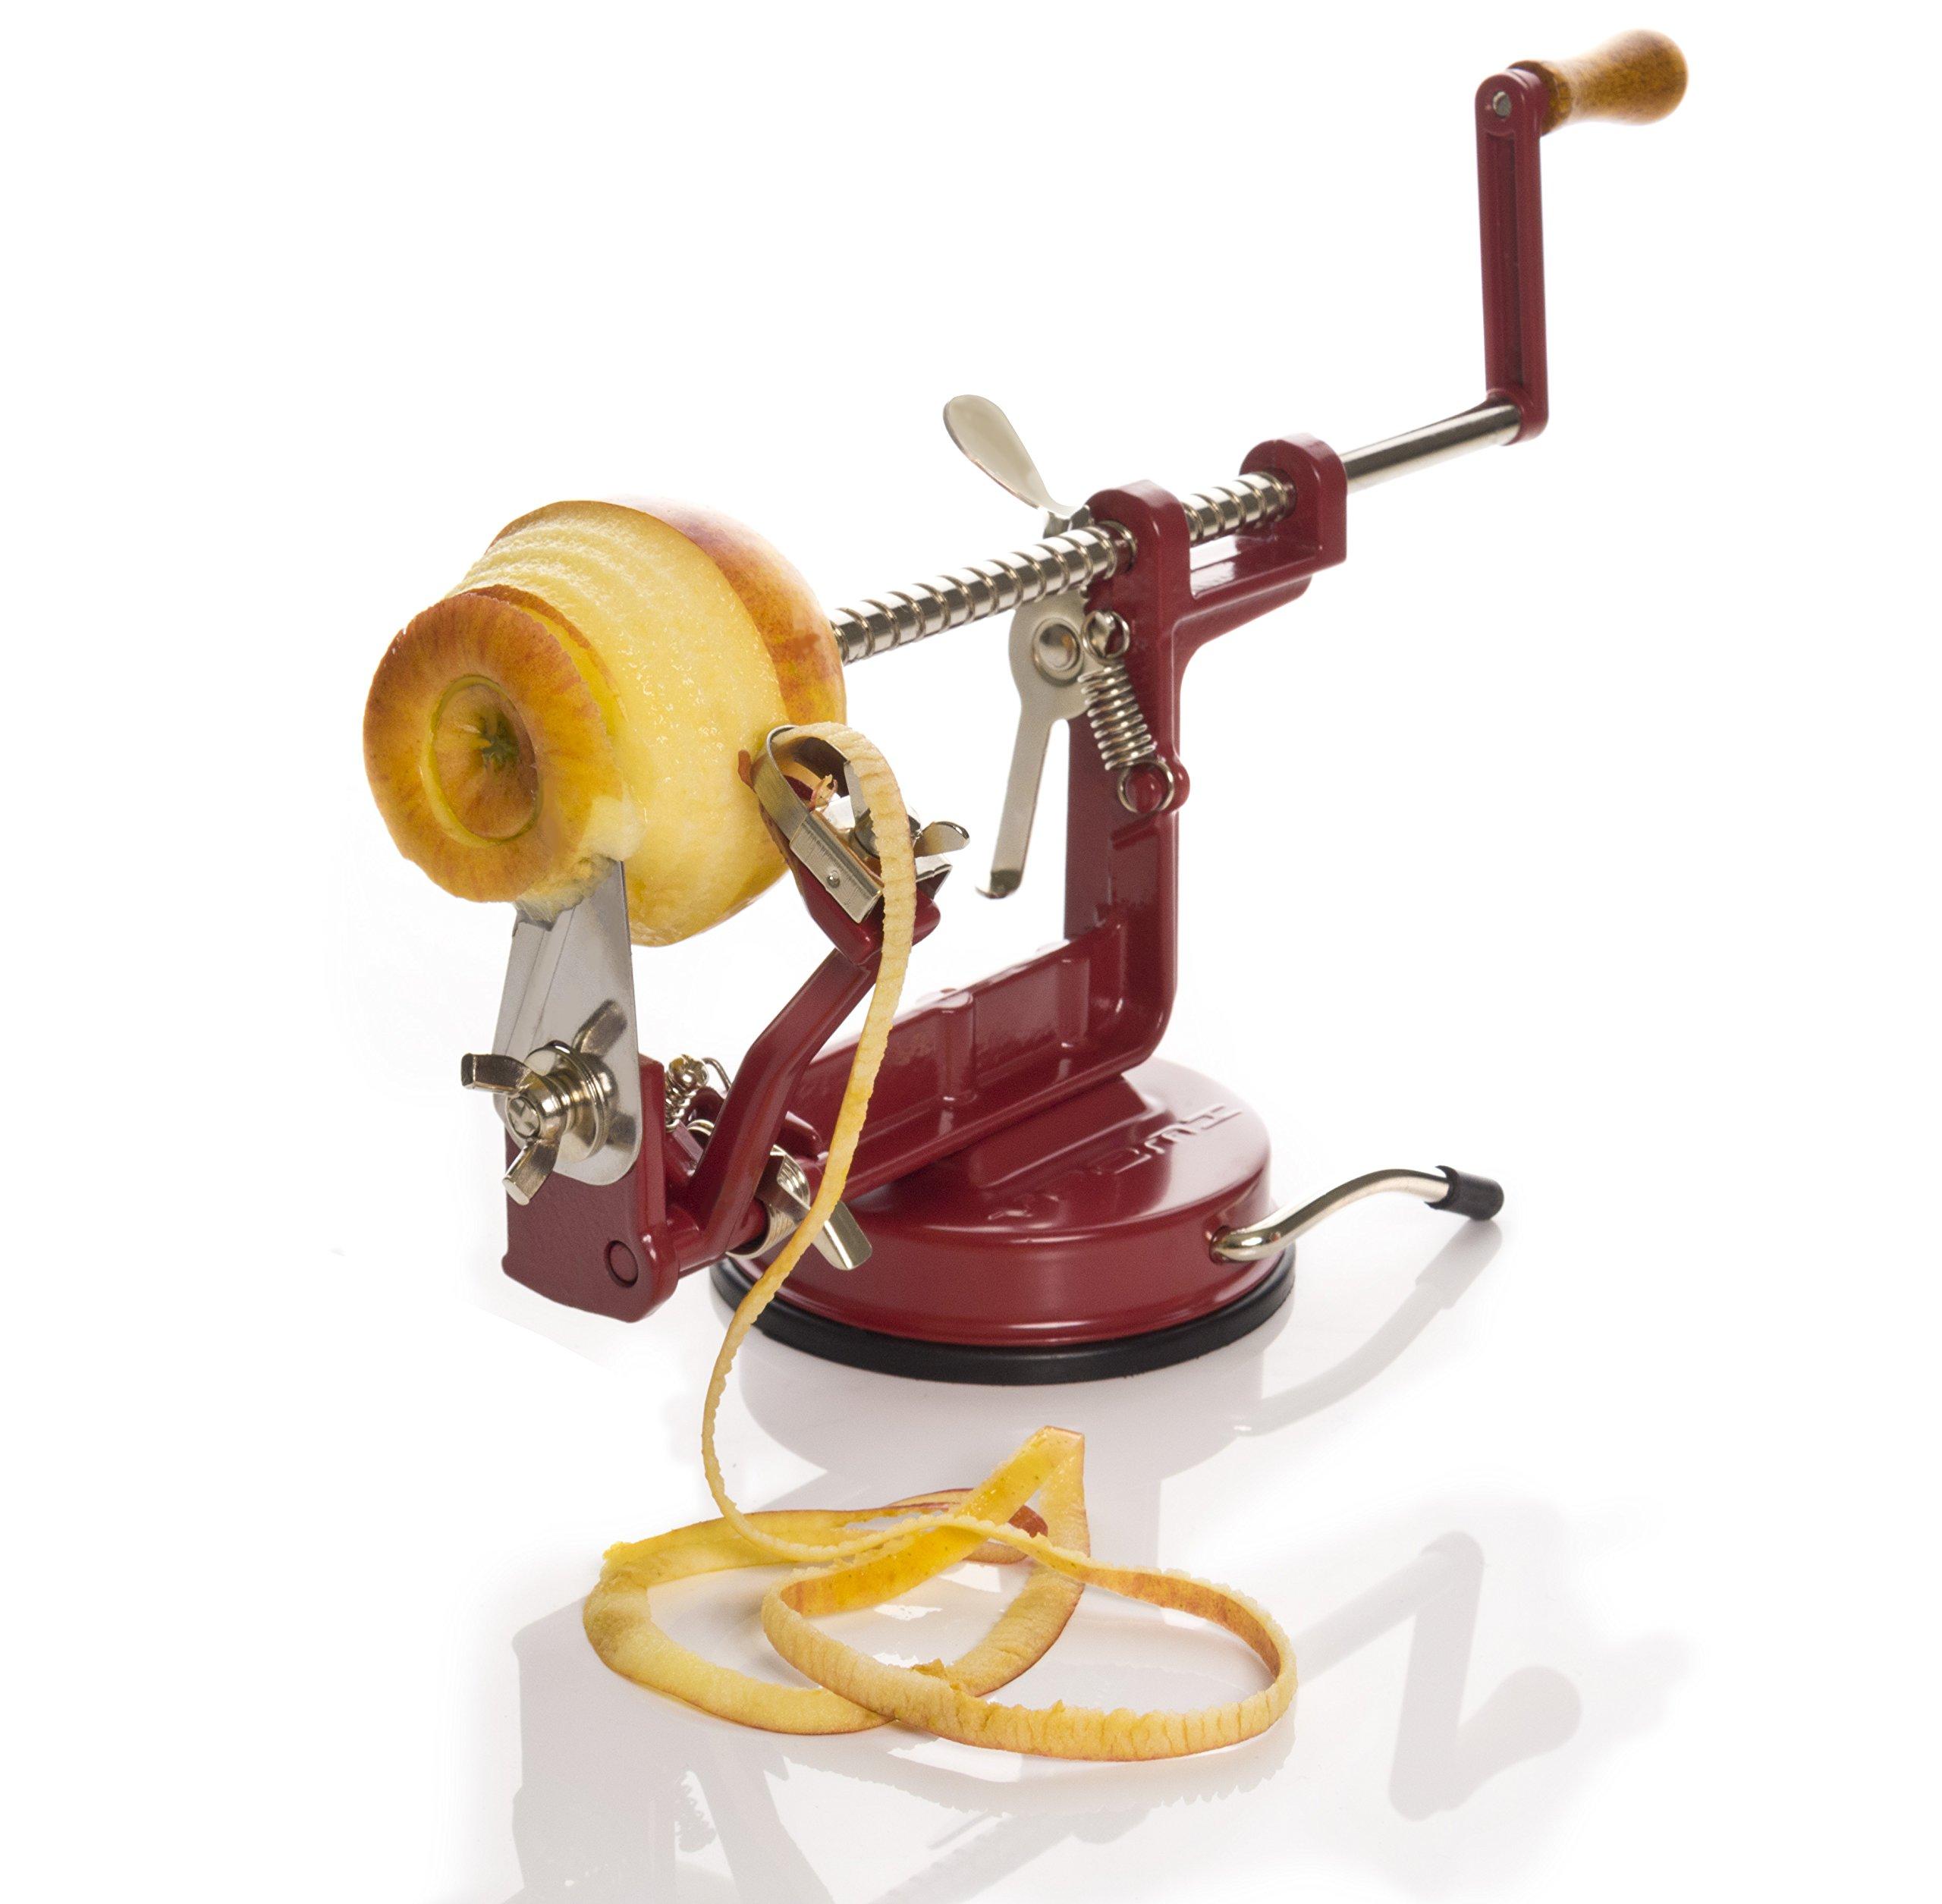 Buy Antique Gadgets Now!